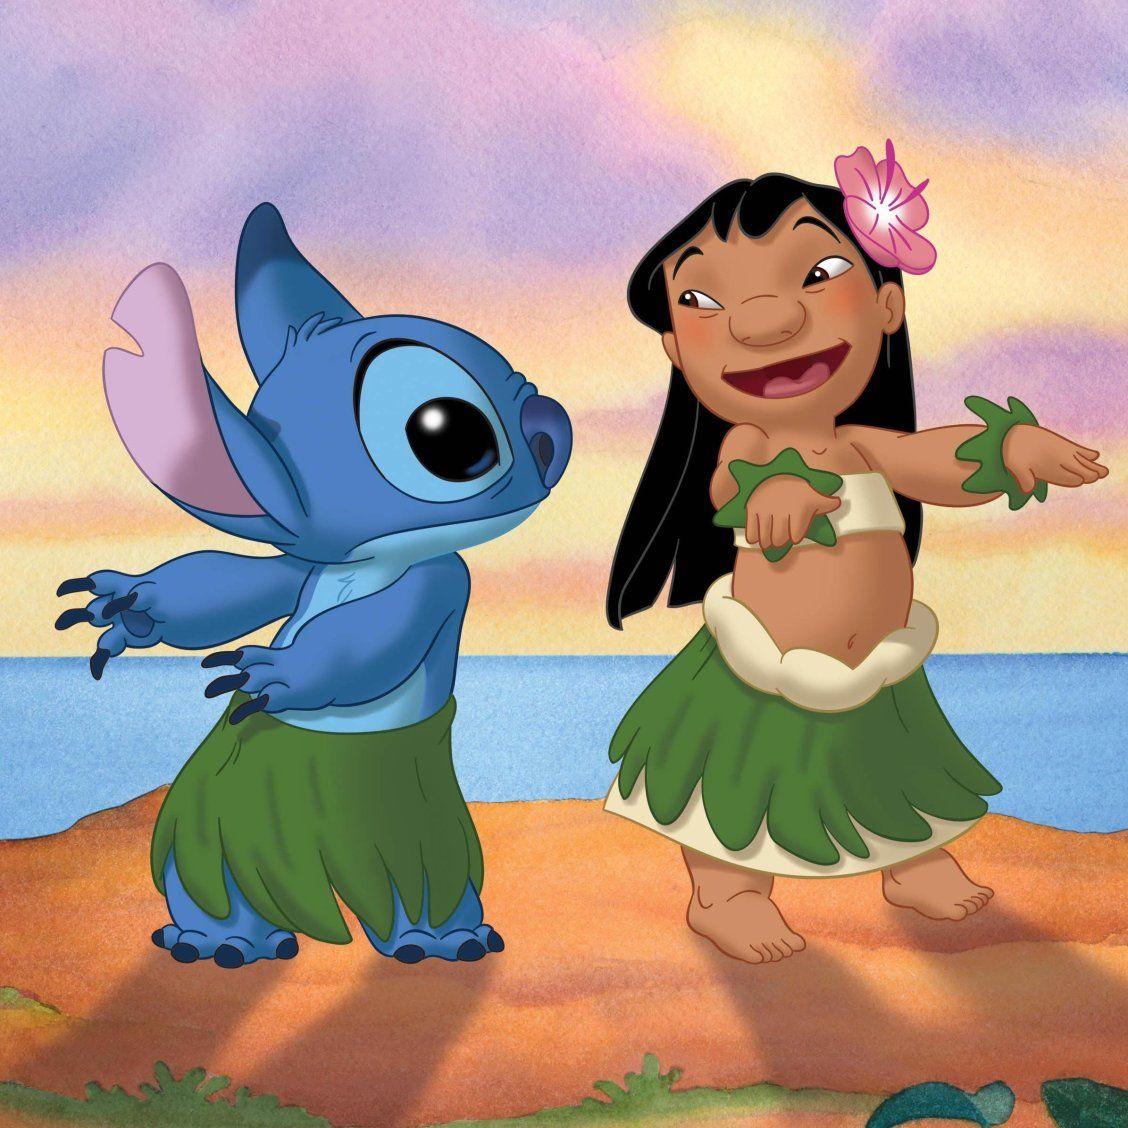 Disney S Lilo And Stitch Is Getting A Live Action Remake Lilo And Stitch 2002 Lilo And Stitch Disney Lilo